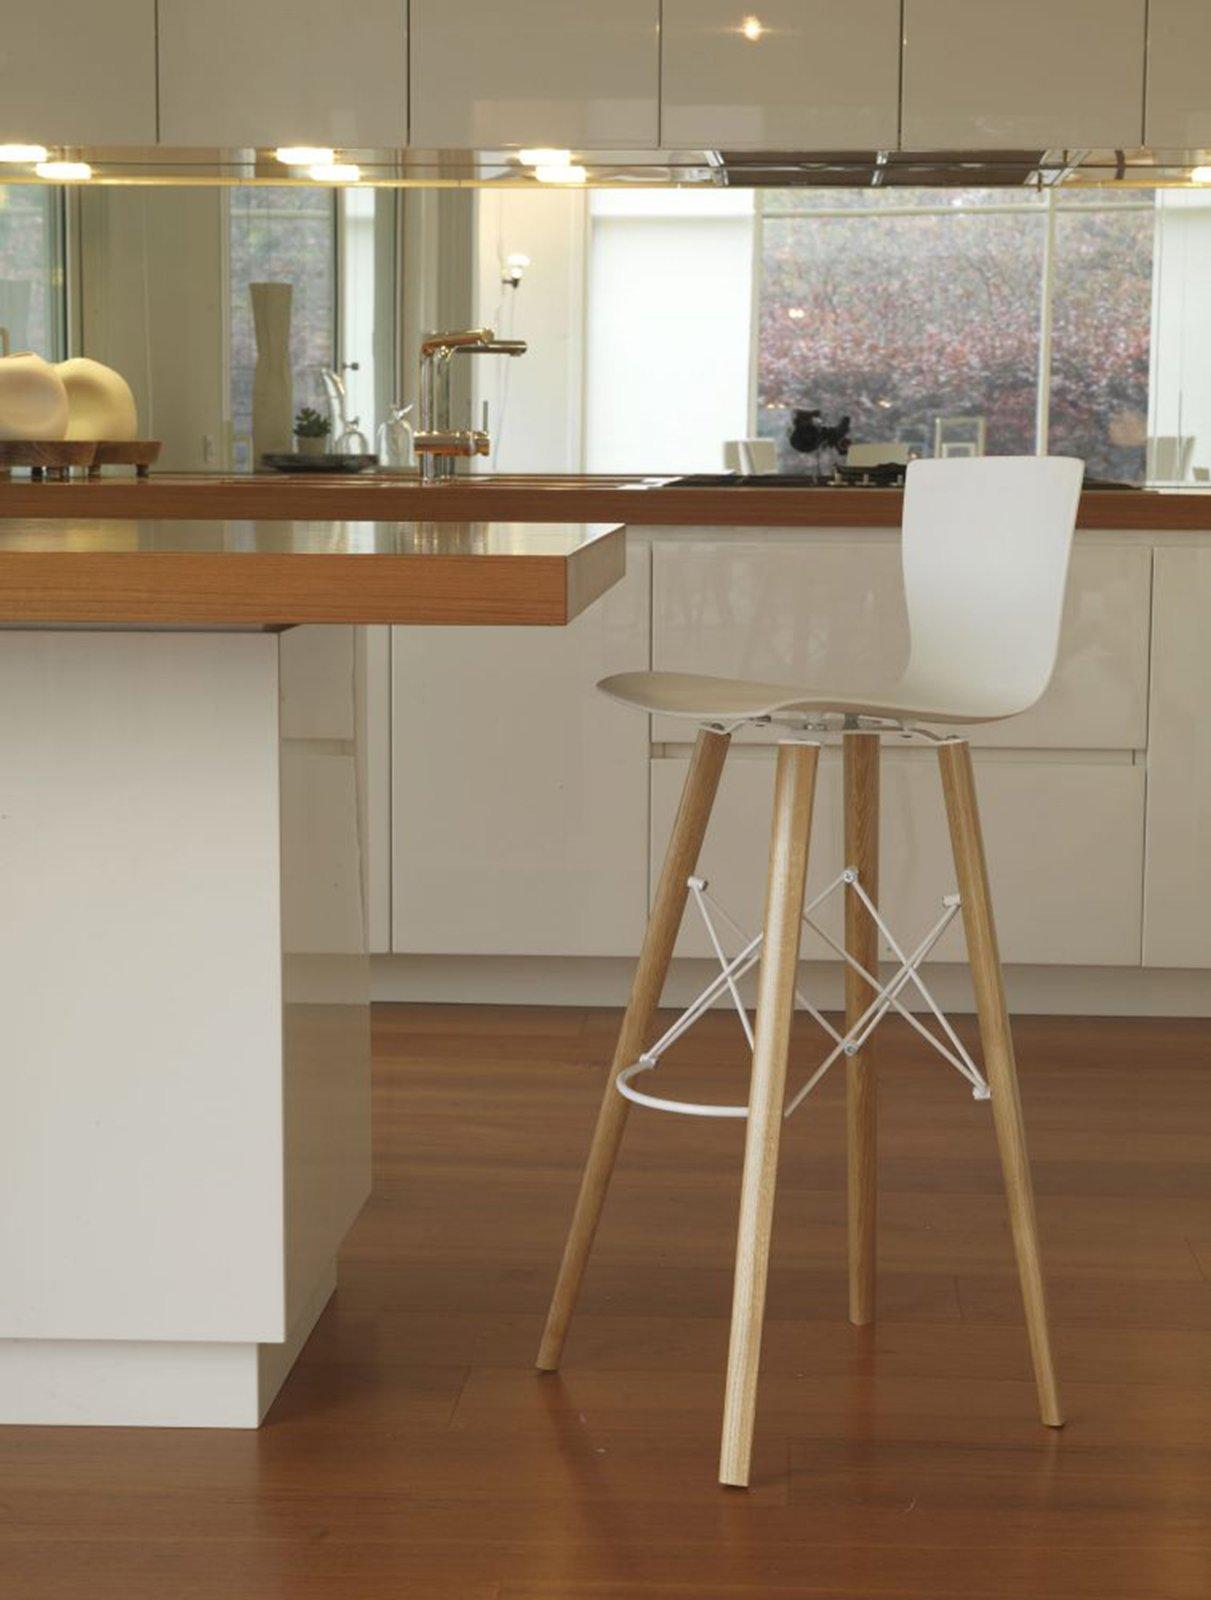 Stunning Sgabelli Da Cucina Gallery - bakeroffroad.us ...